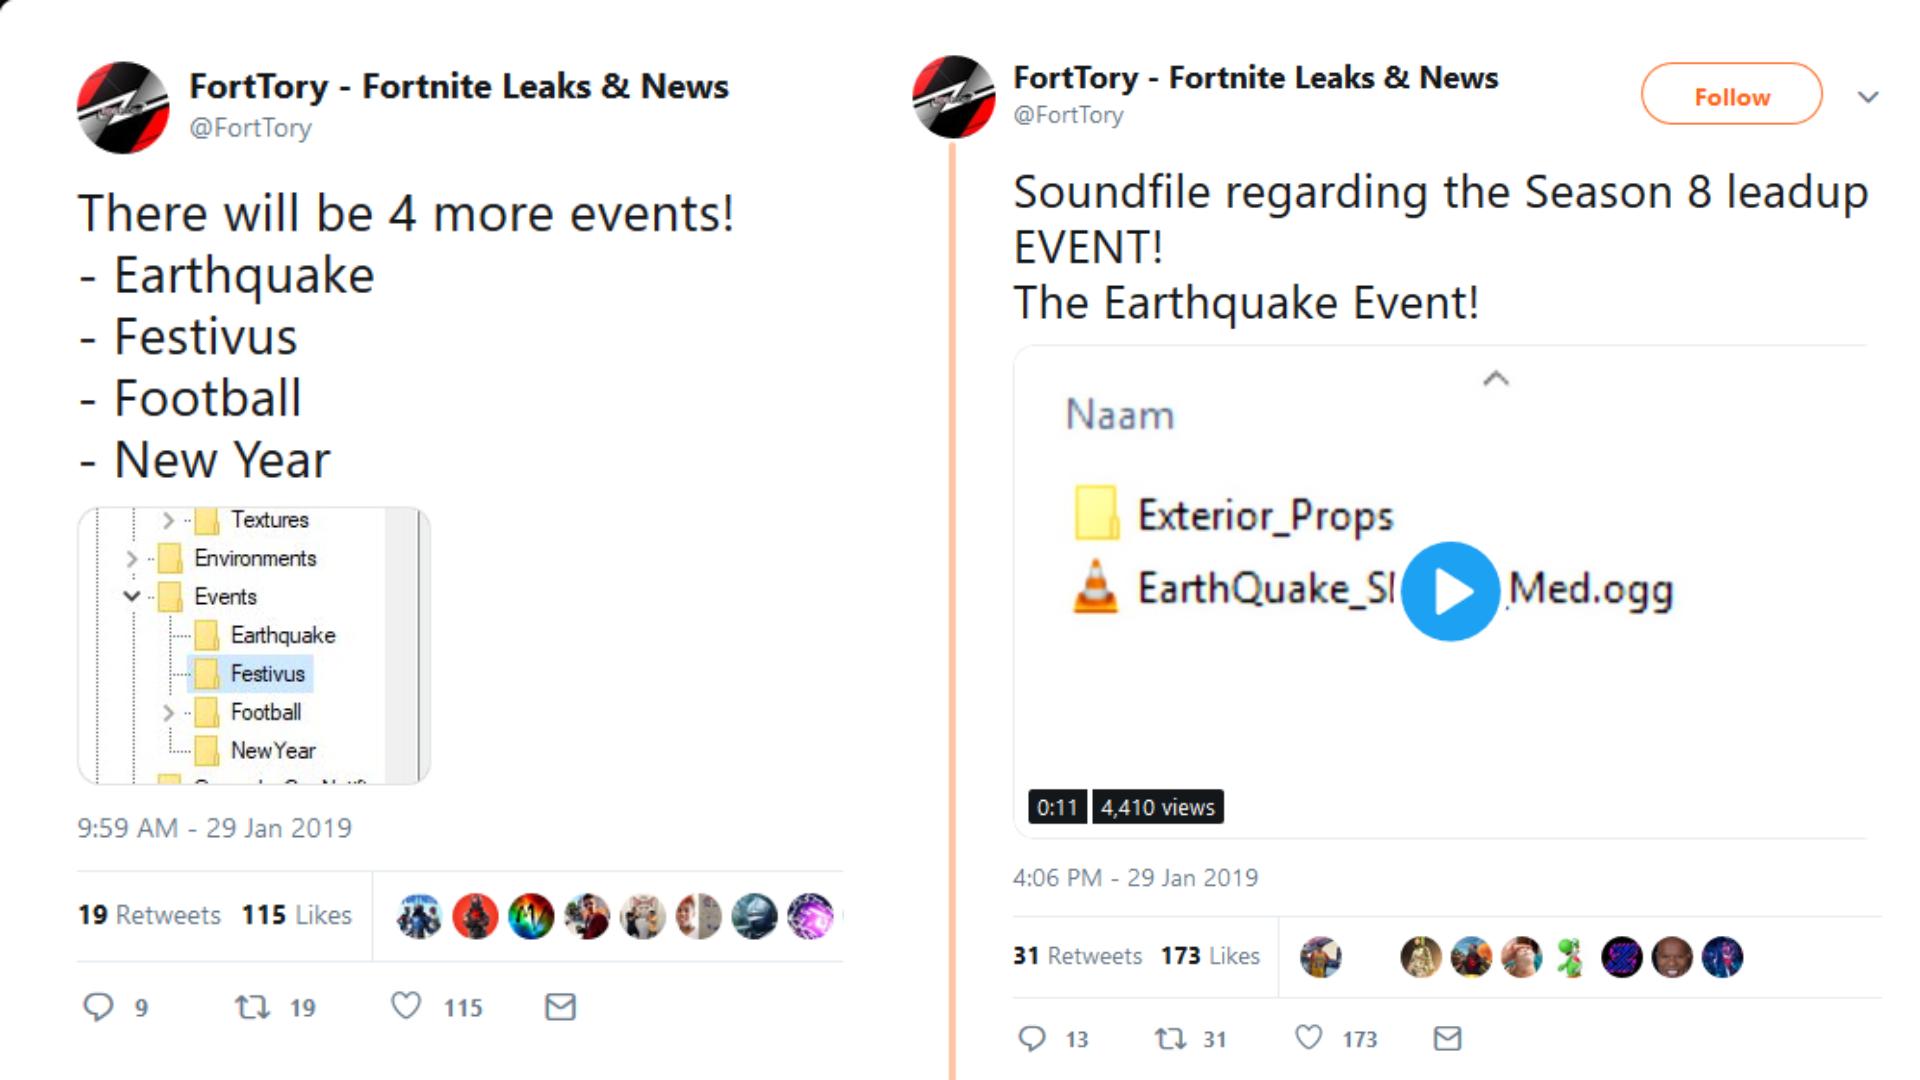 fortnite season 8 event earthquake files leaked - fortnite fire king event date